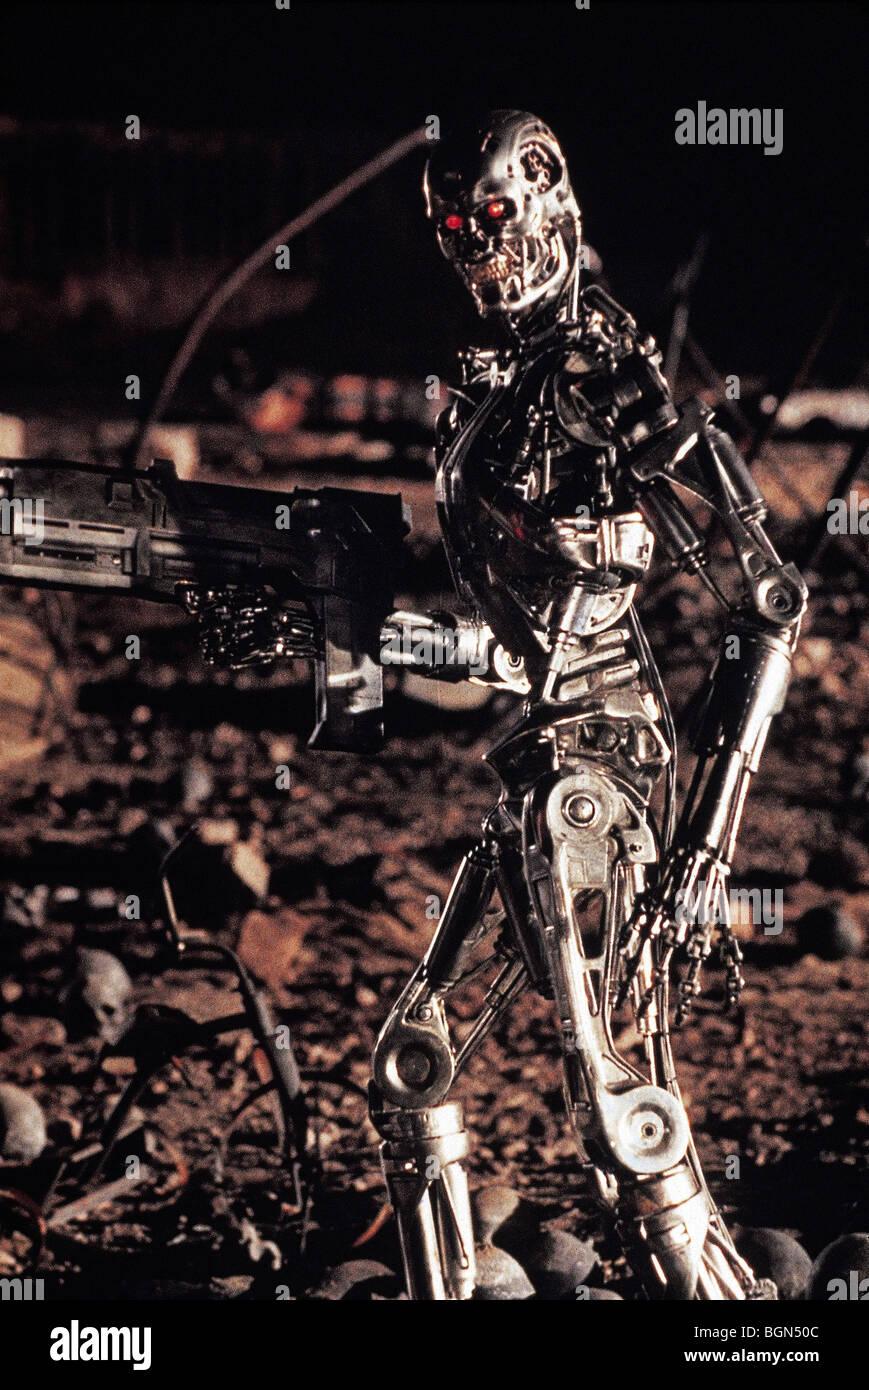 Terminator 2: Judgment Day  Year : 1991  Director : James Cameron - Stock Image